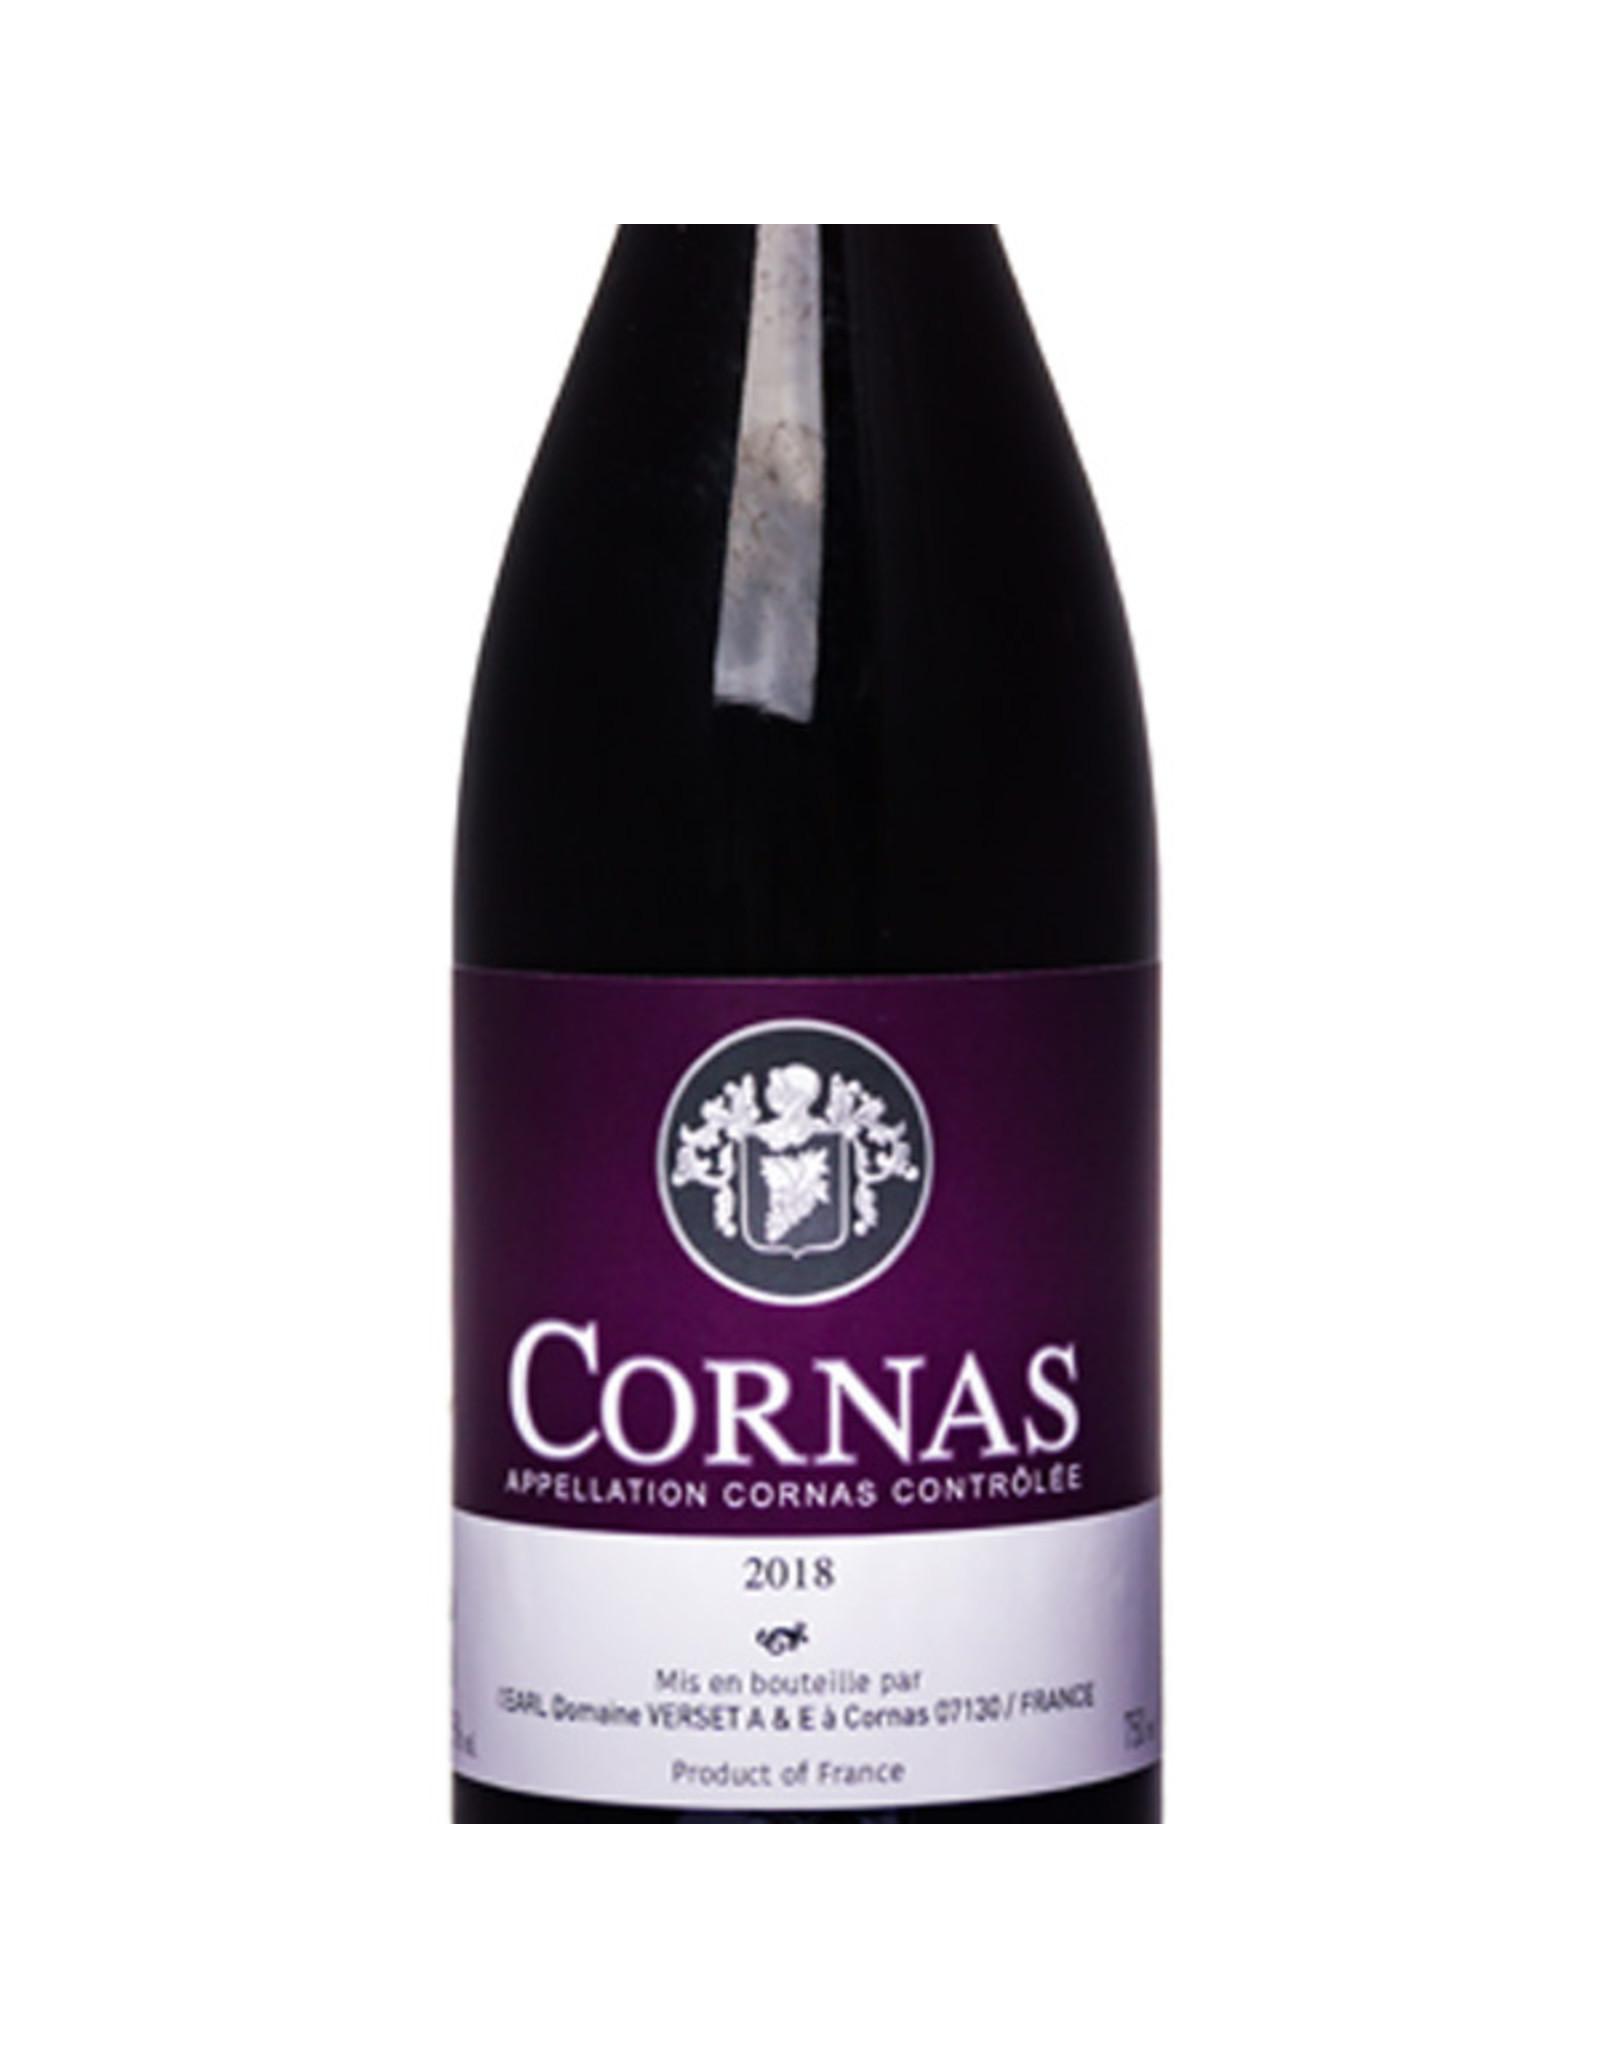 Domaine Verset, Cornas Domaine Verset Cornas 2018 1.5